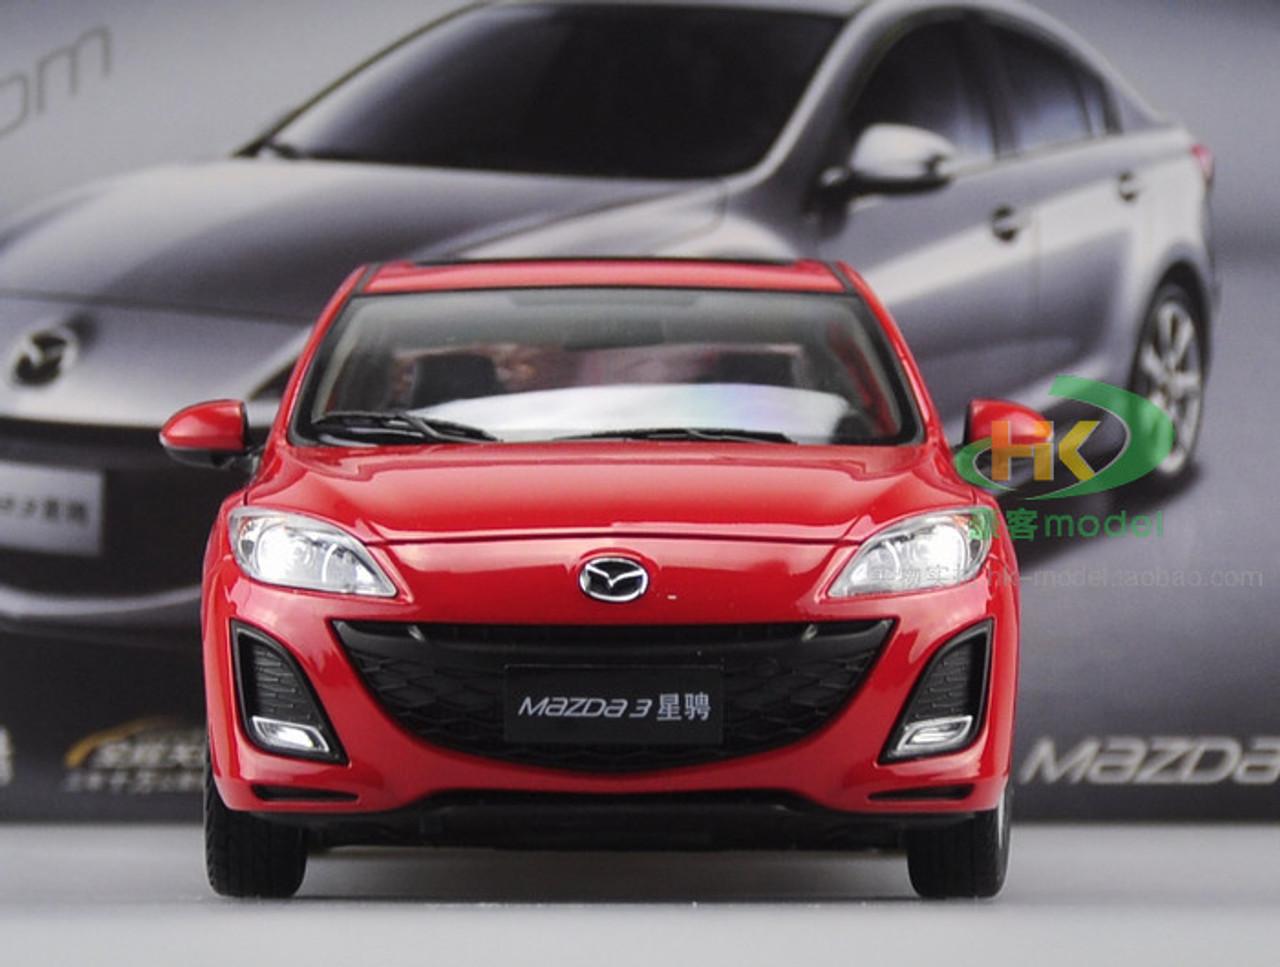 RARE DEALER EDITION 1/18 MAZDA 3 (RED) DIECAST CAR MODEL